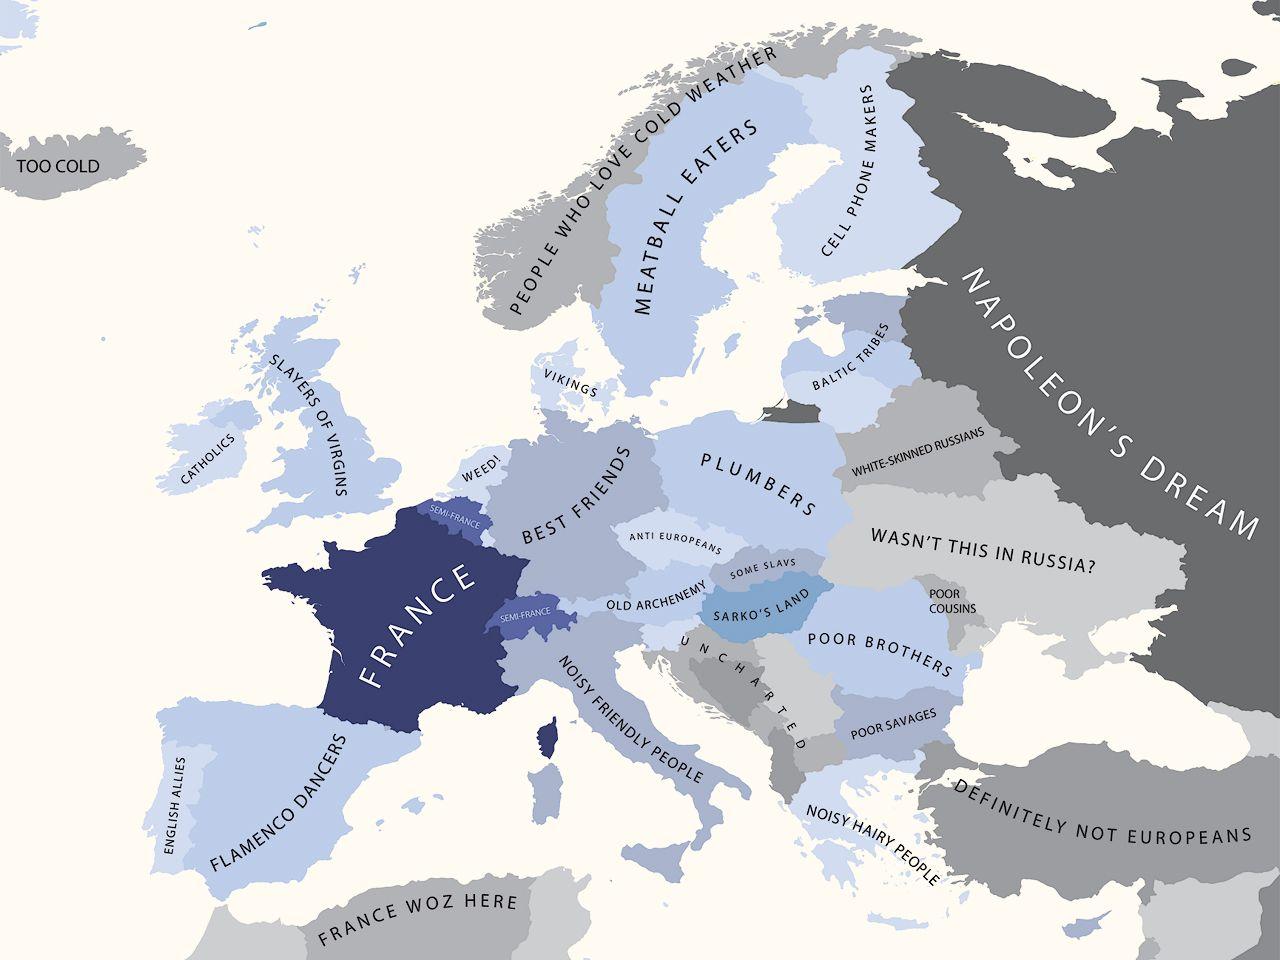 Cartes des strotypes europens cartes des strotypes europens europe france divers carte information gumiabroncs Gallery